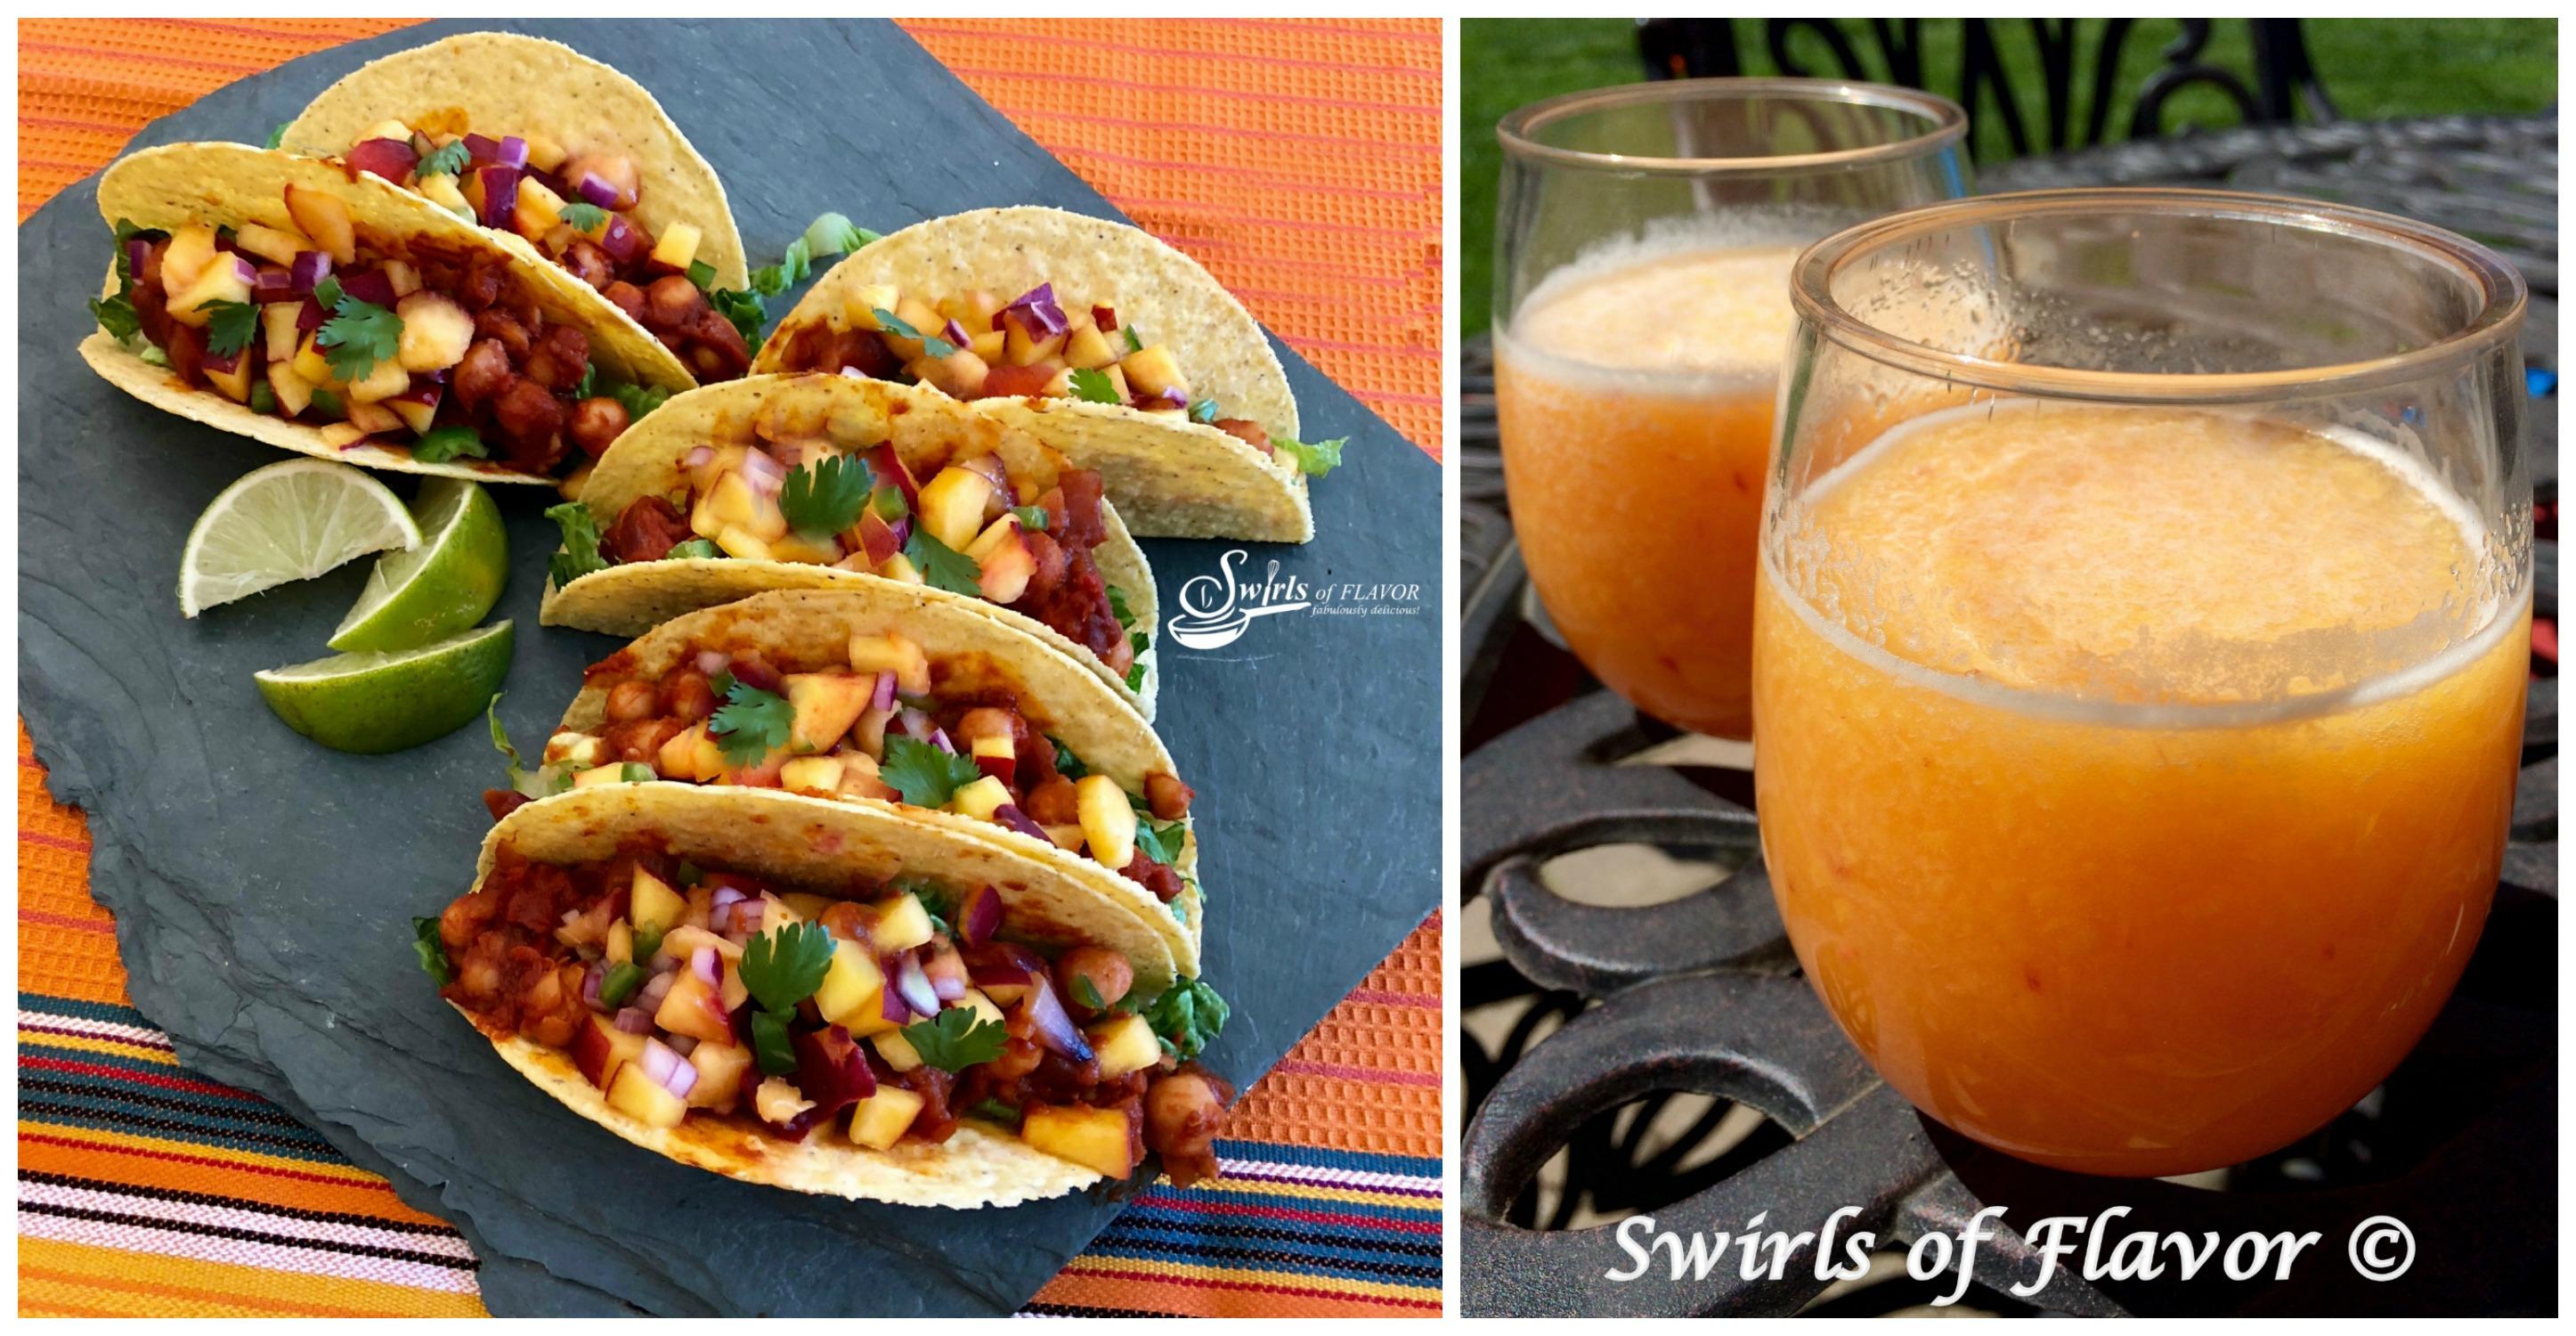 Vegan Tacos With Peach Salsa and Peach Bellini Slushy